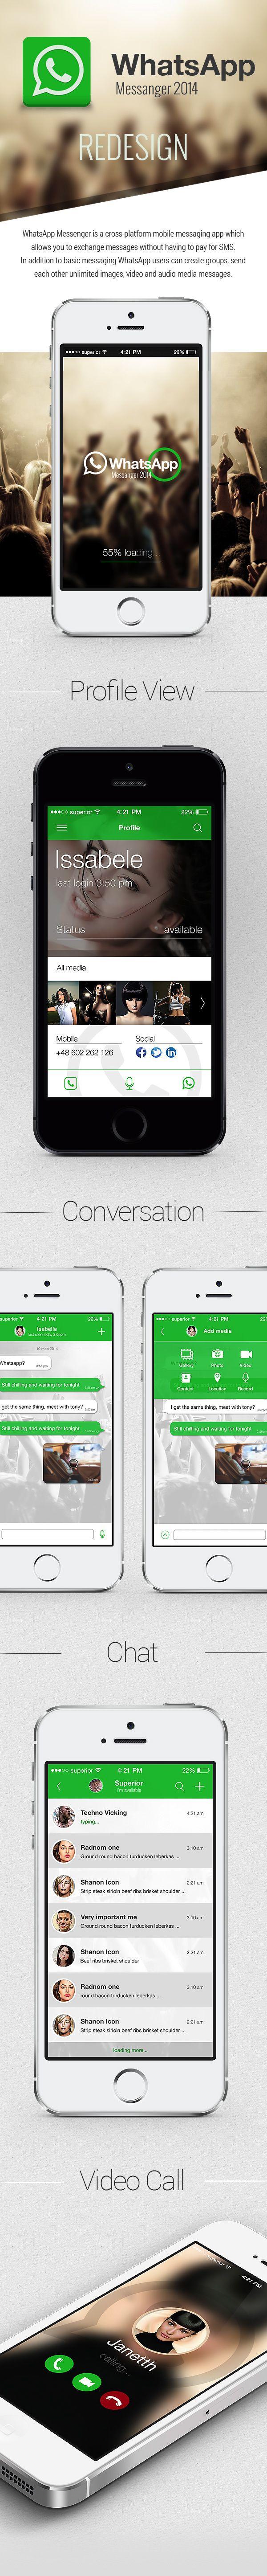 WhatsApp Redesign on Behance